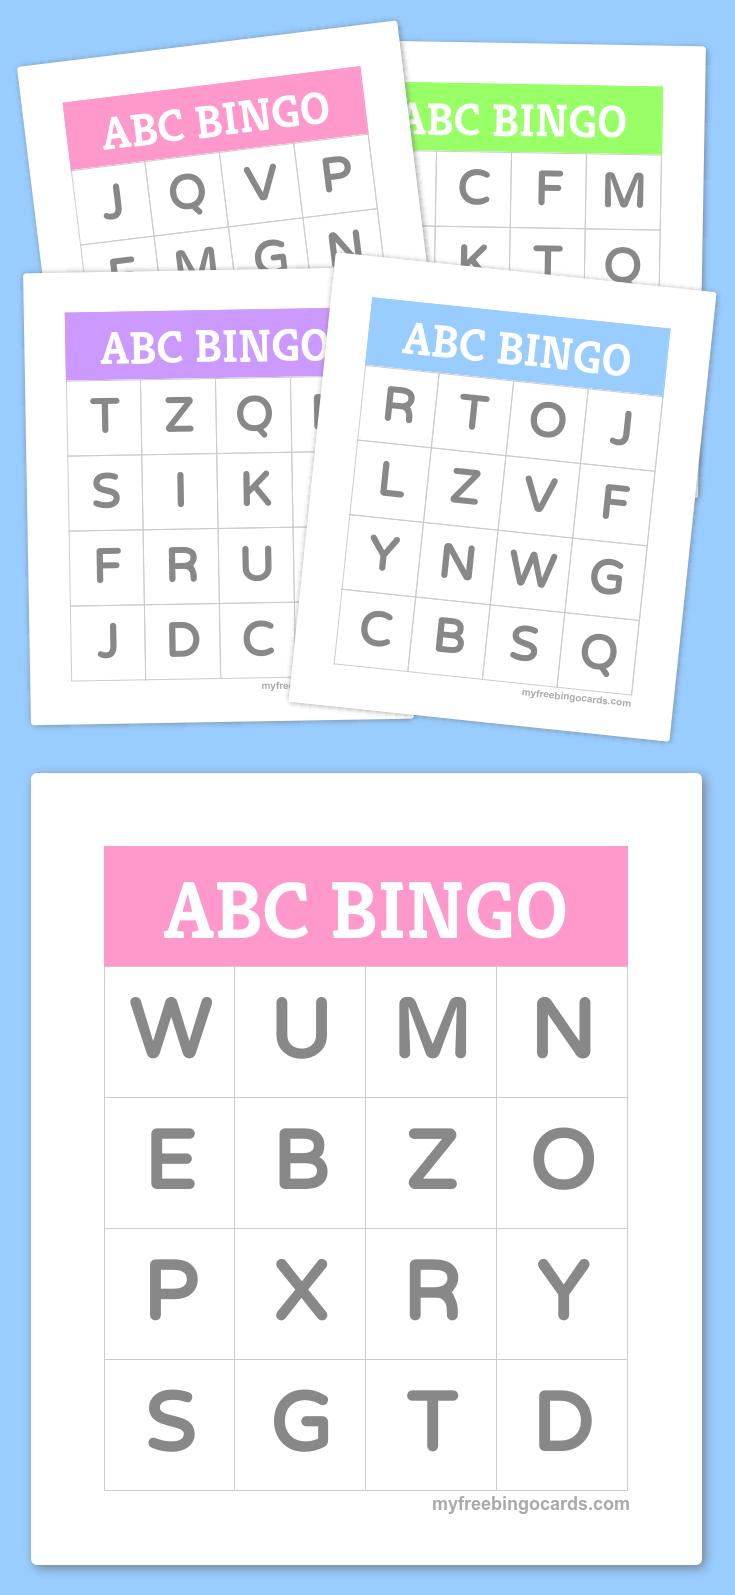 Free Printable Bingo Cards | Bingo Cards | Preschool Learning, Abc - Free Printable Alphabet Bingo Cards